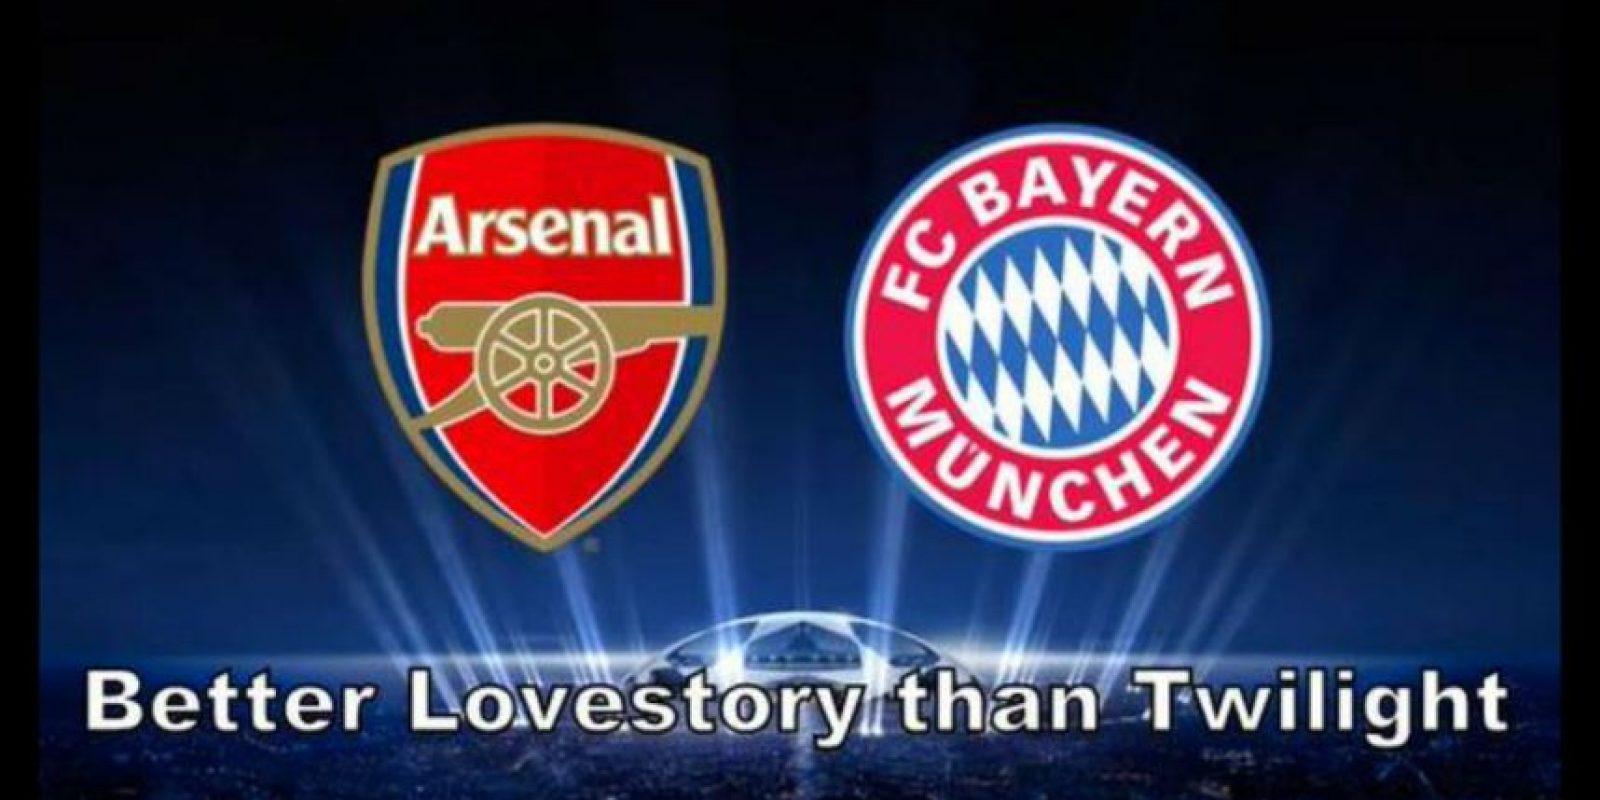 Al Arsenal tampoco le agradó mucho toparse al Bayern Munich. Foto:Vía twitter.com